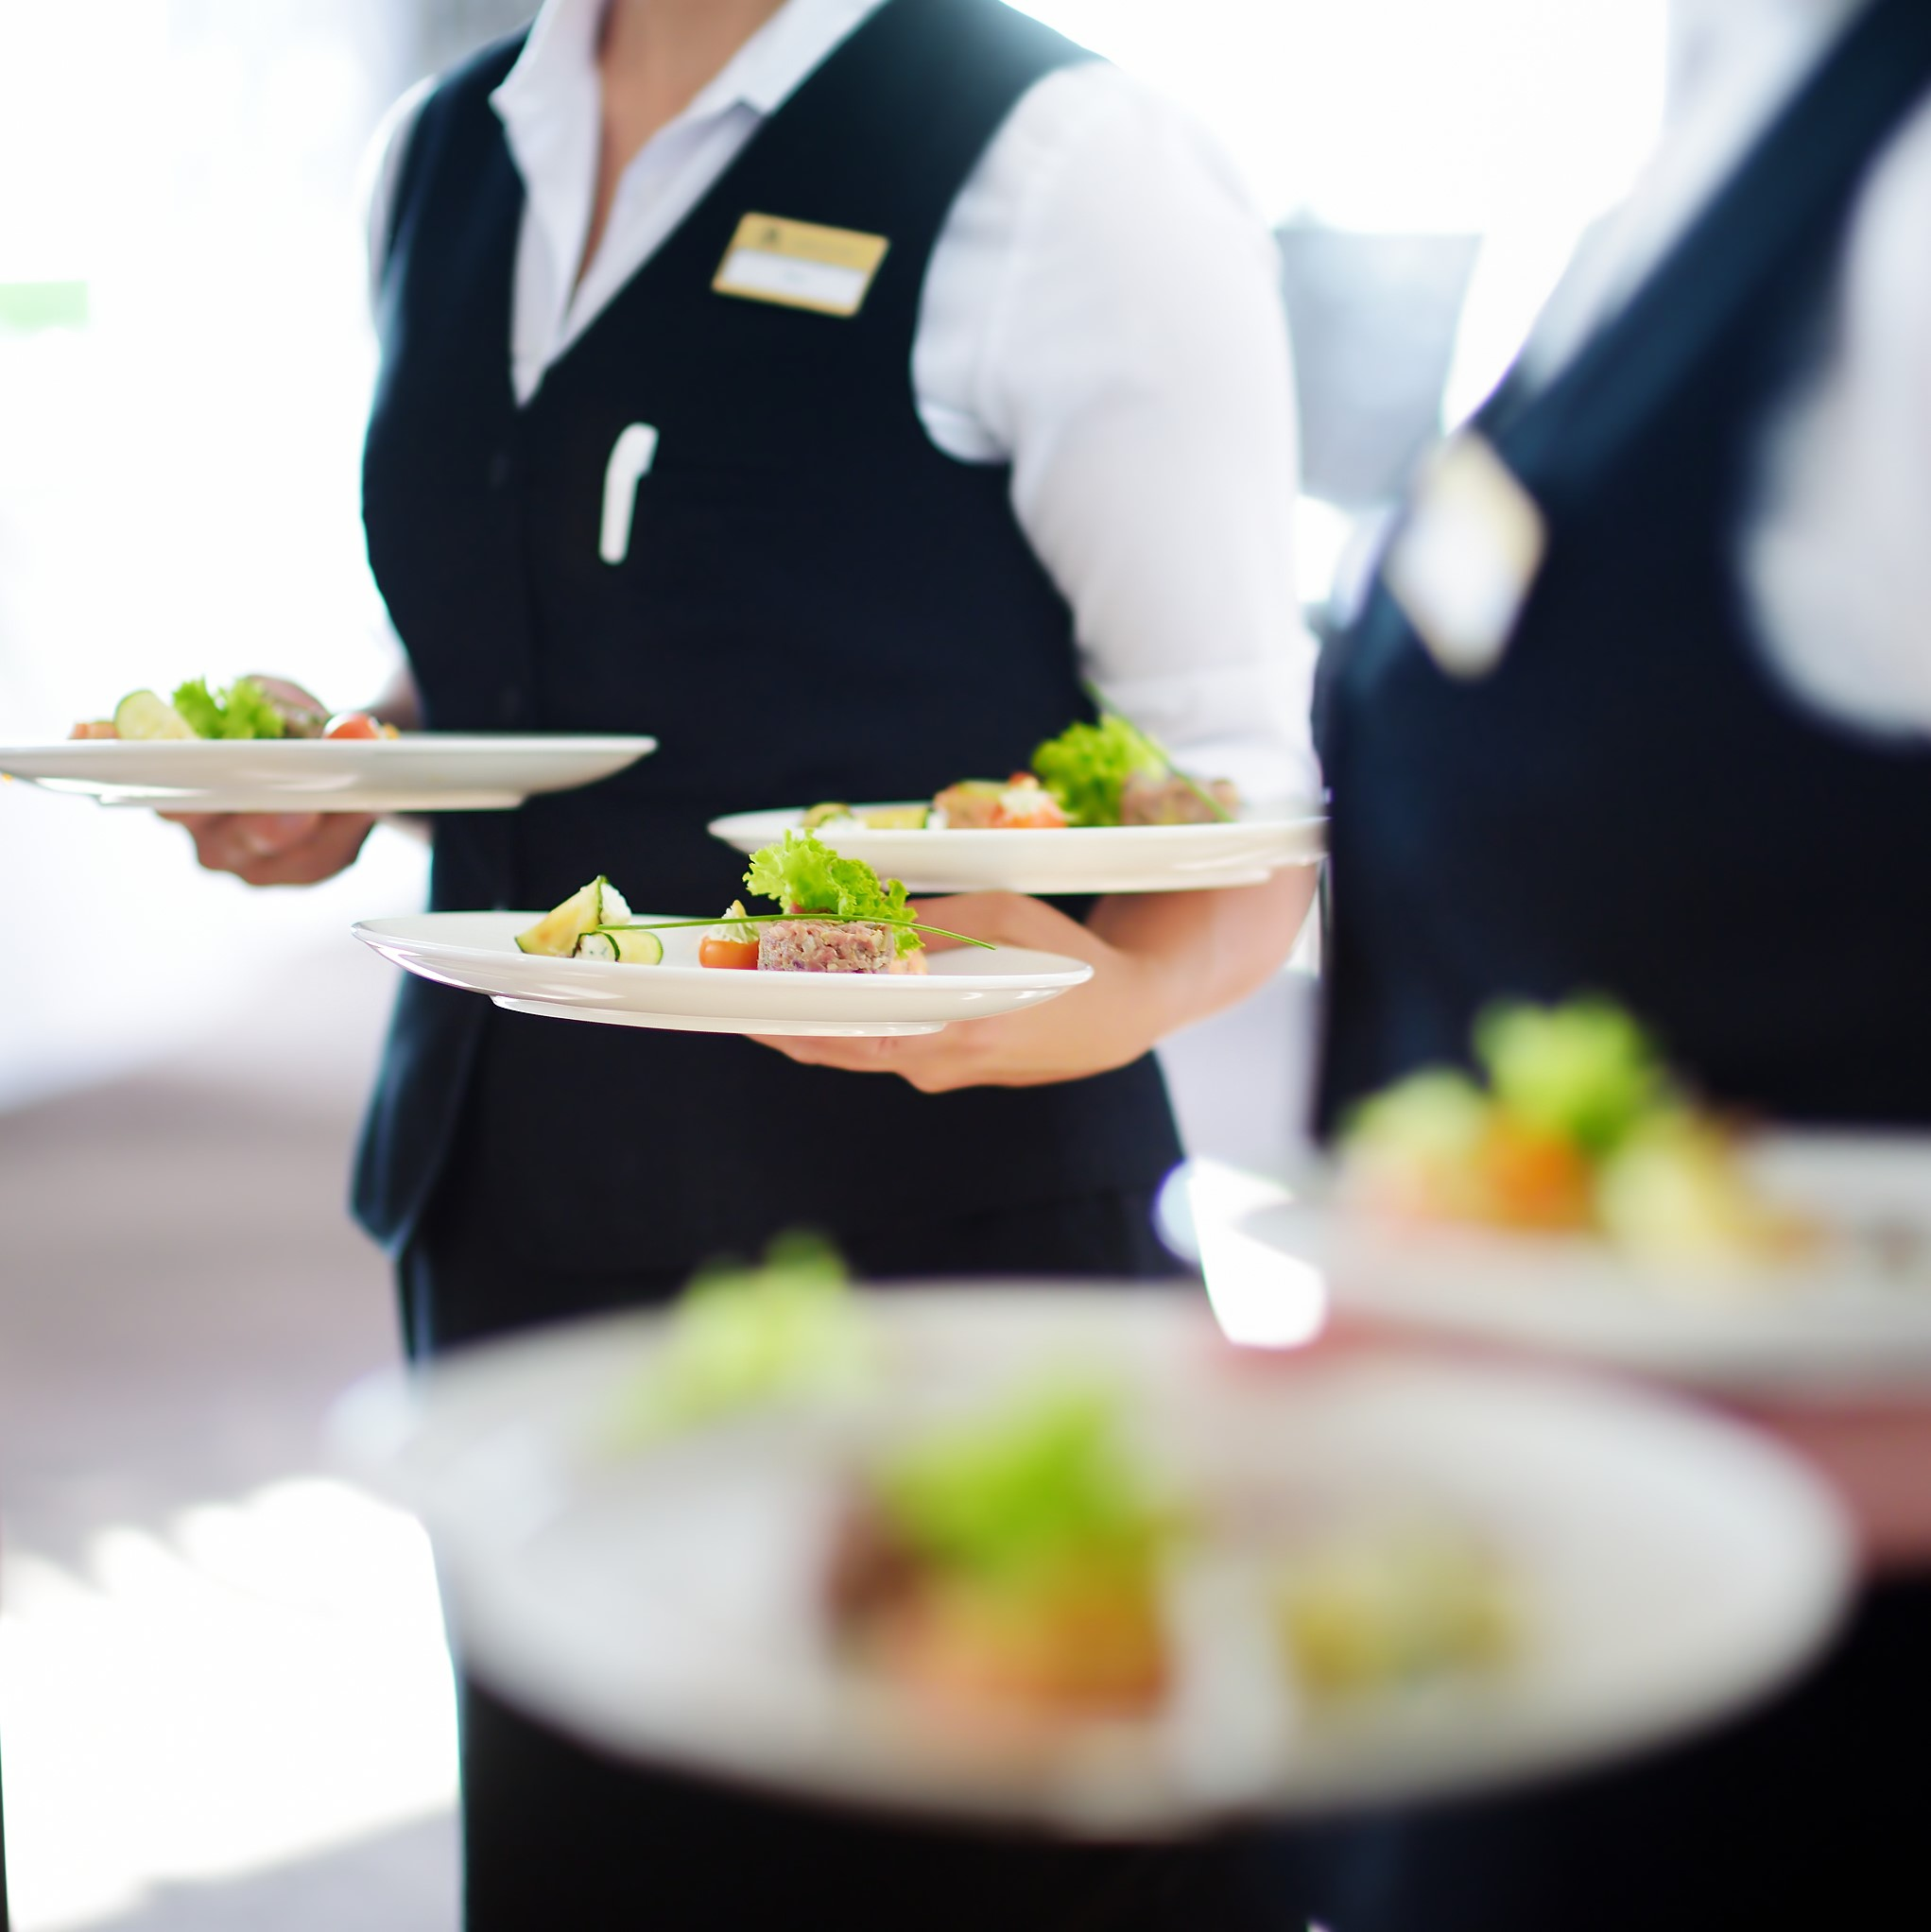 Award Ceremony Catering Service